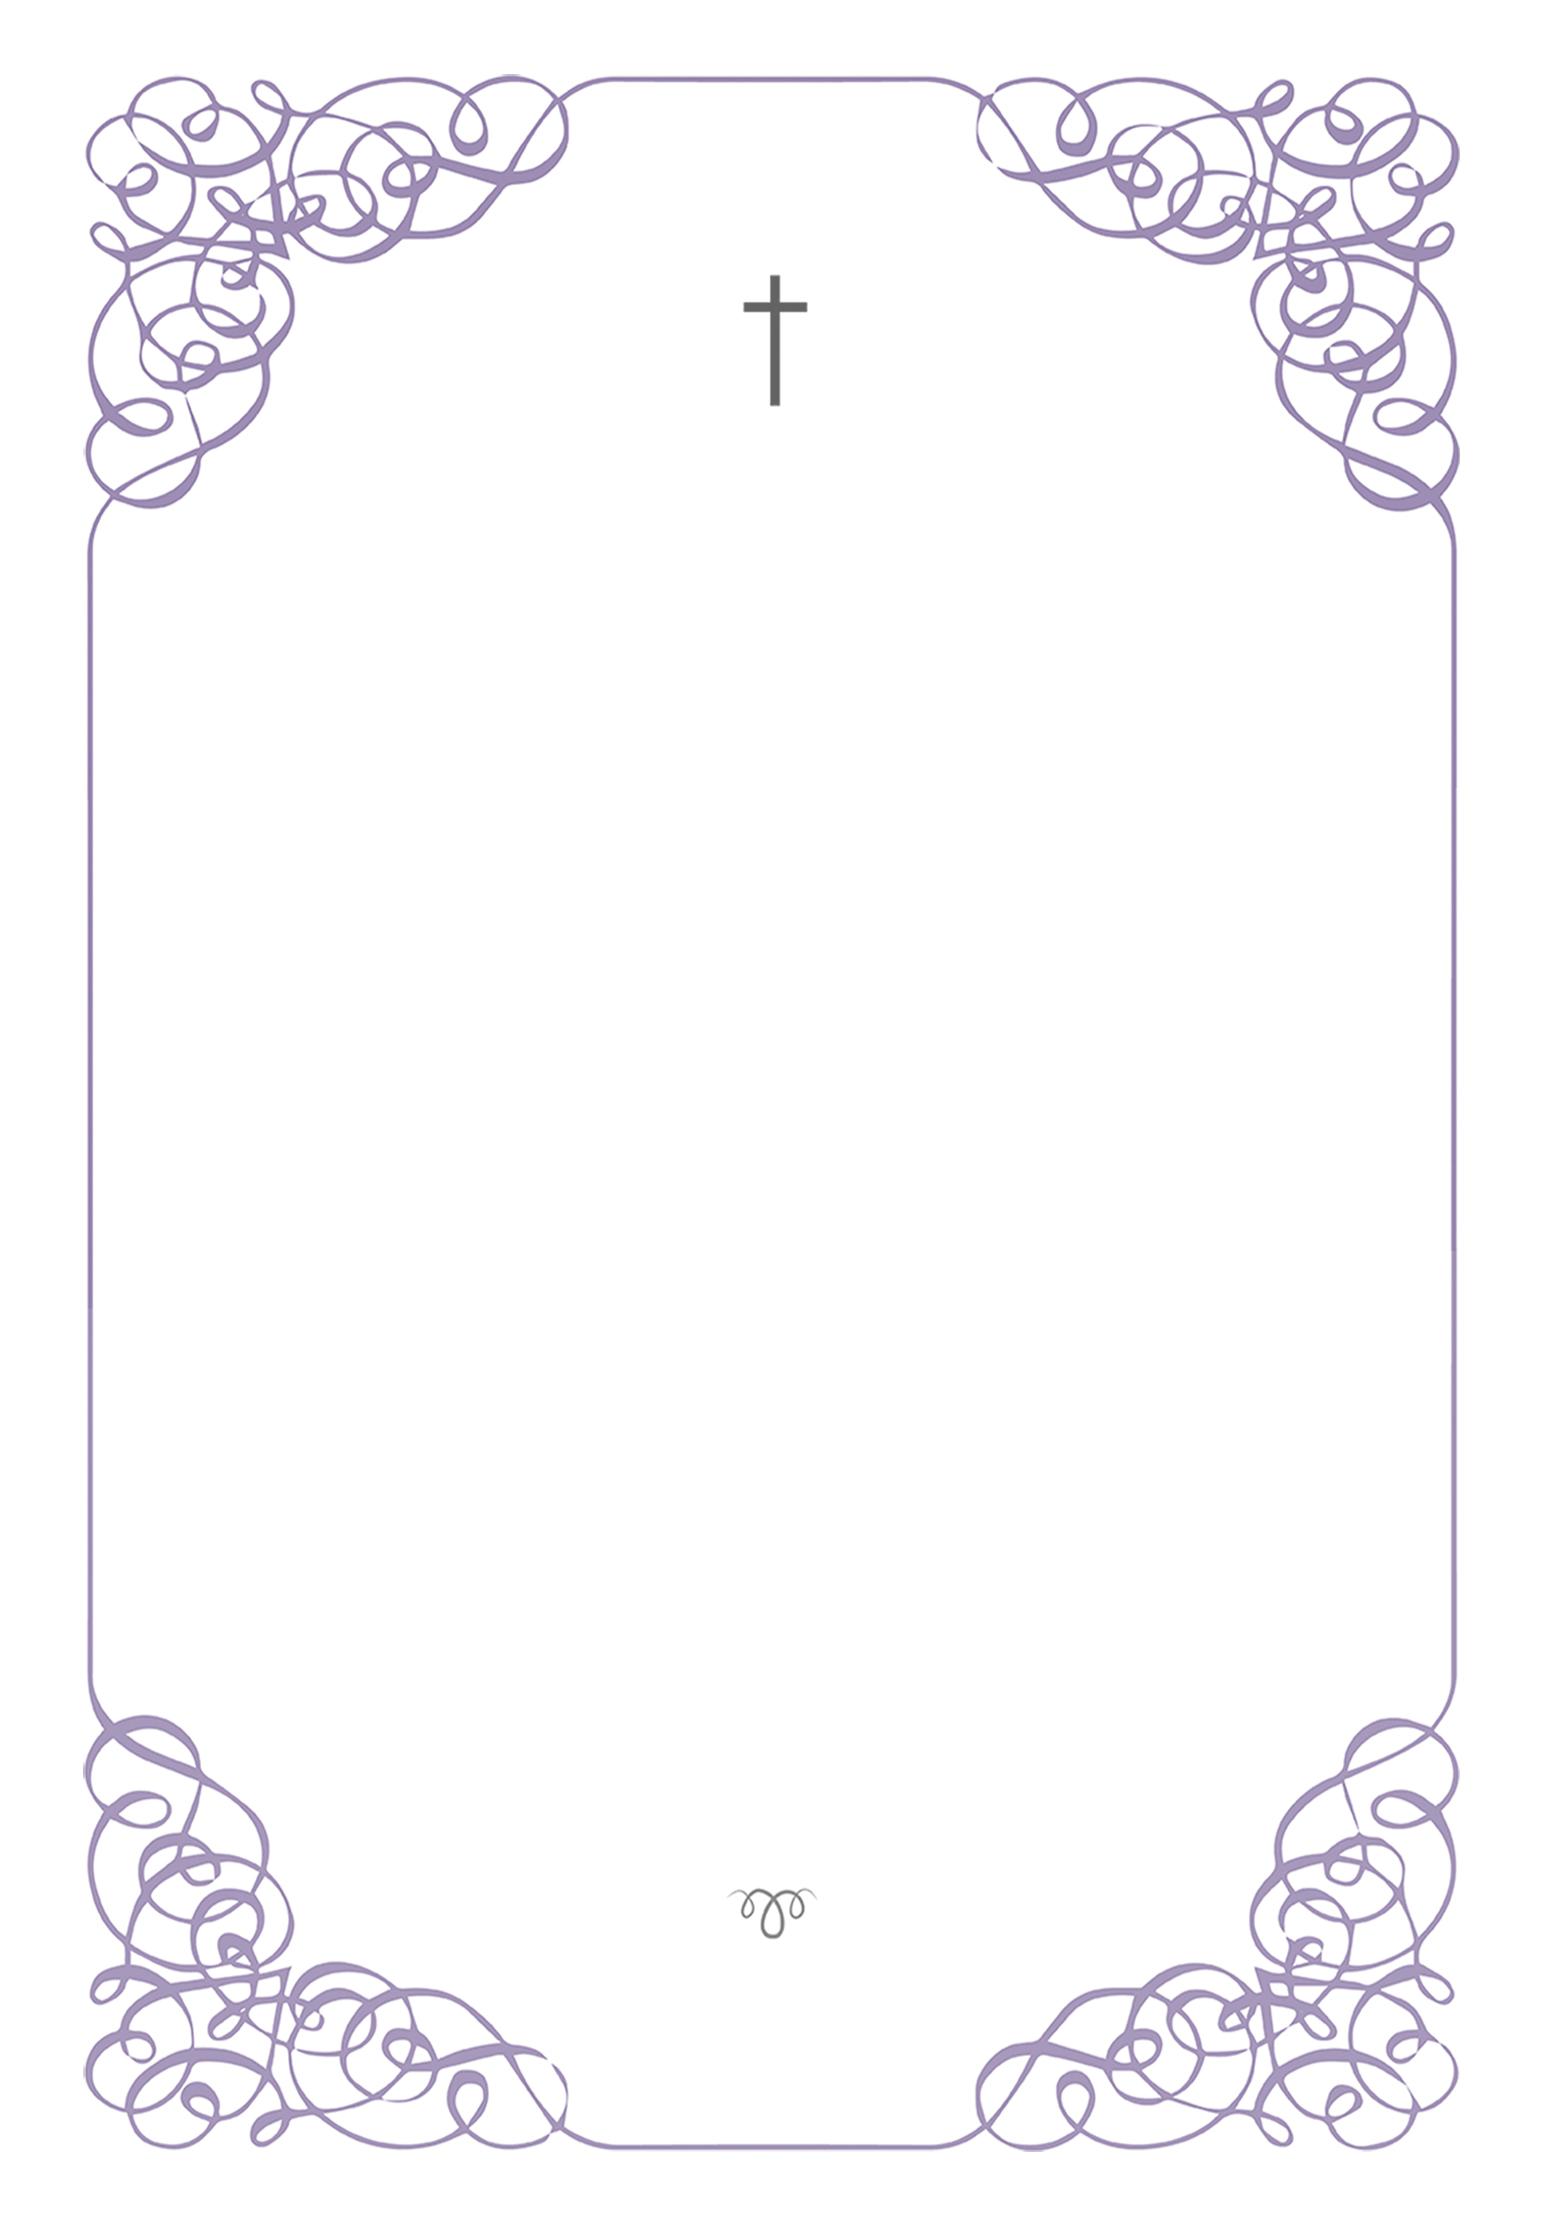 First Communion Invitation Template - Tutlin.psstech.co - Free Printable 1St Communion Invitations